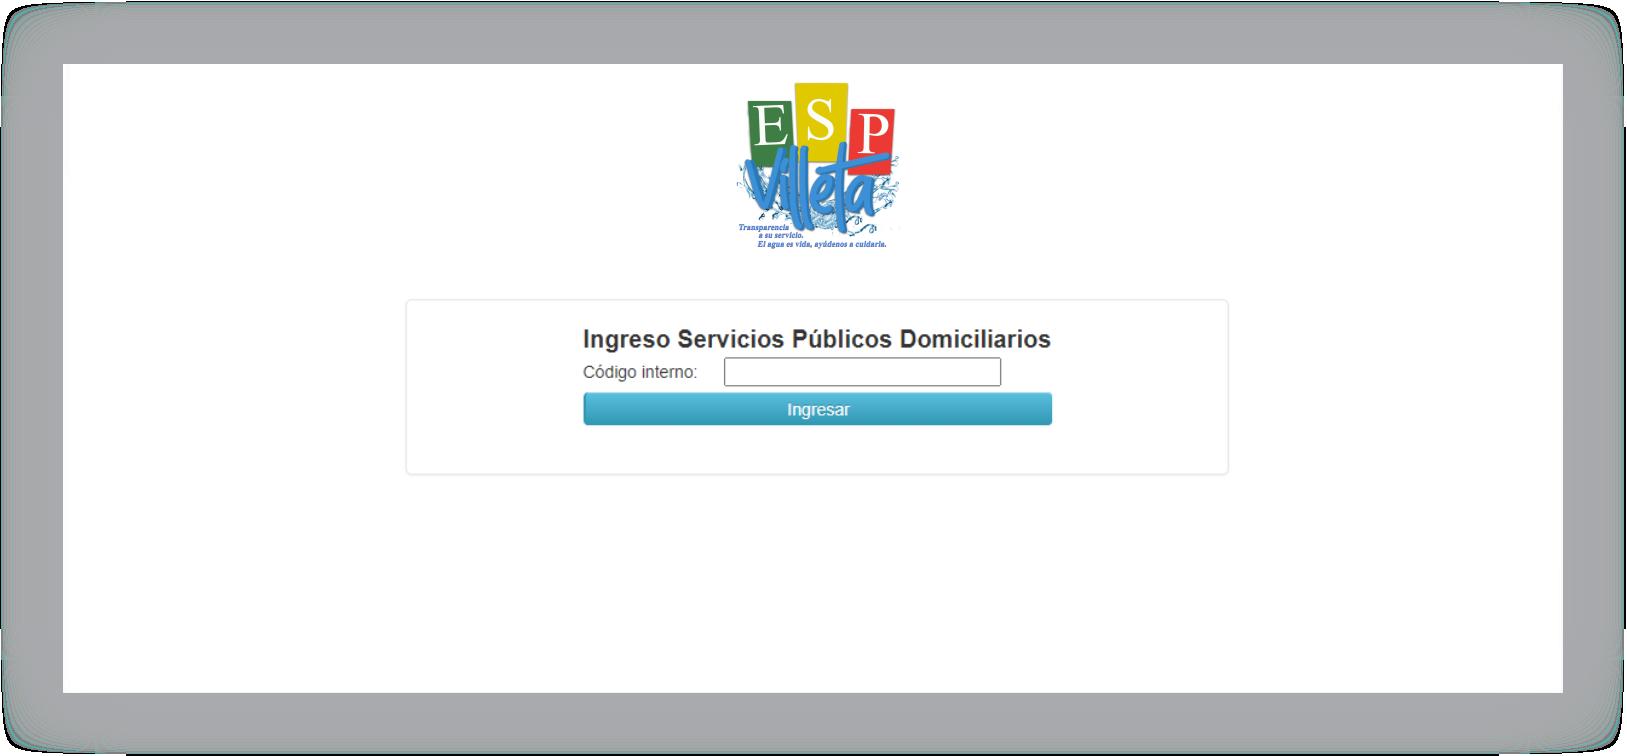 https://espvilleta.gov.co/wp-content/uploads/2020/08/Pago-1D.png